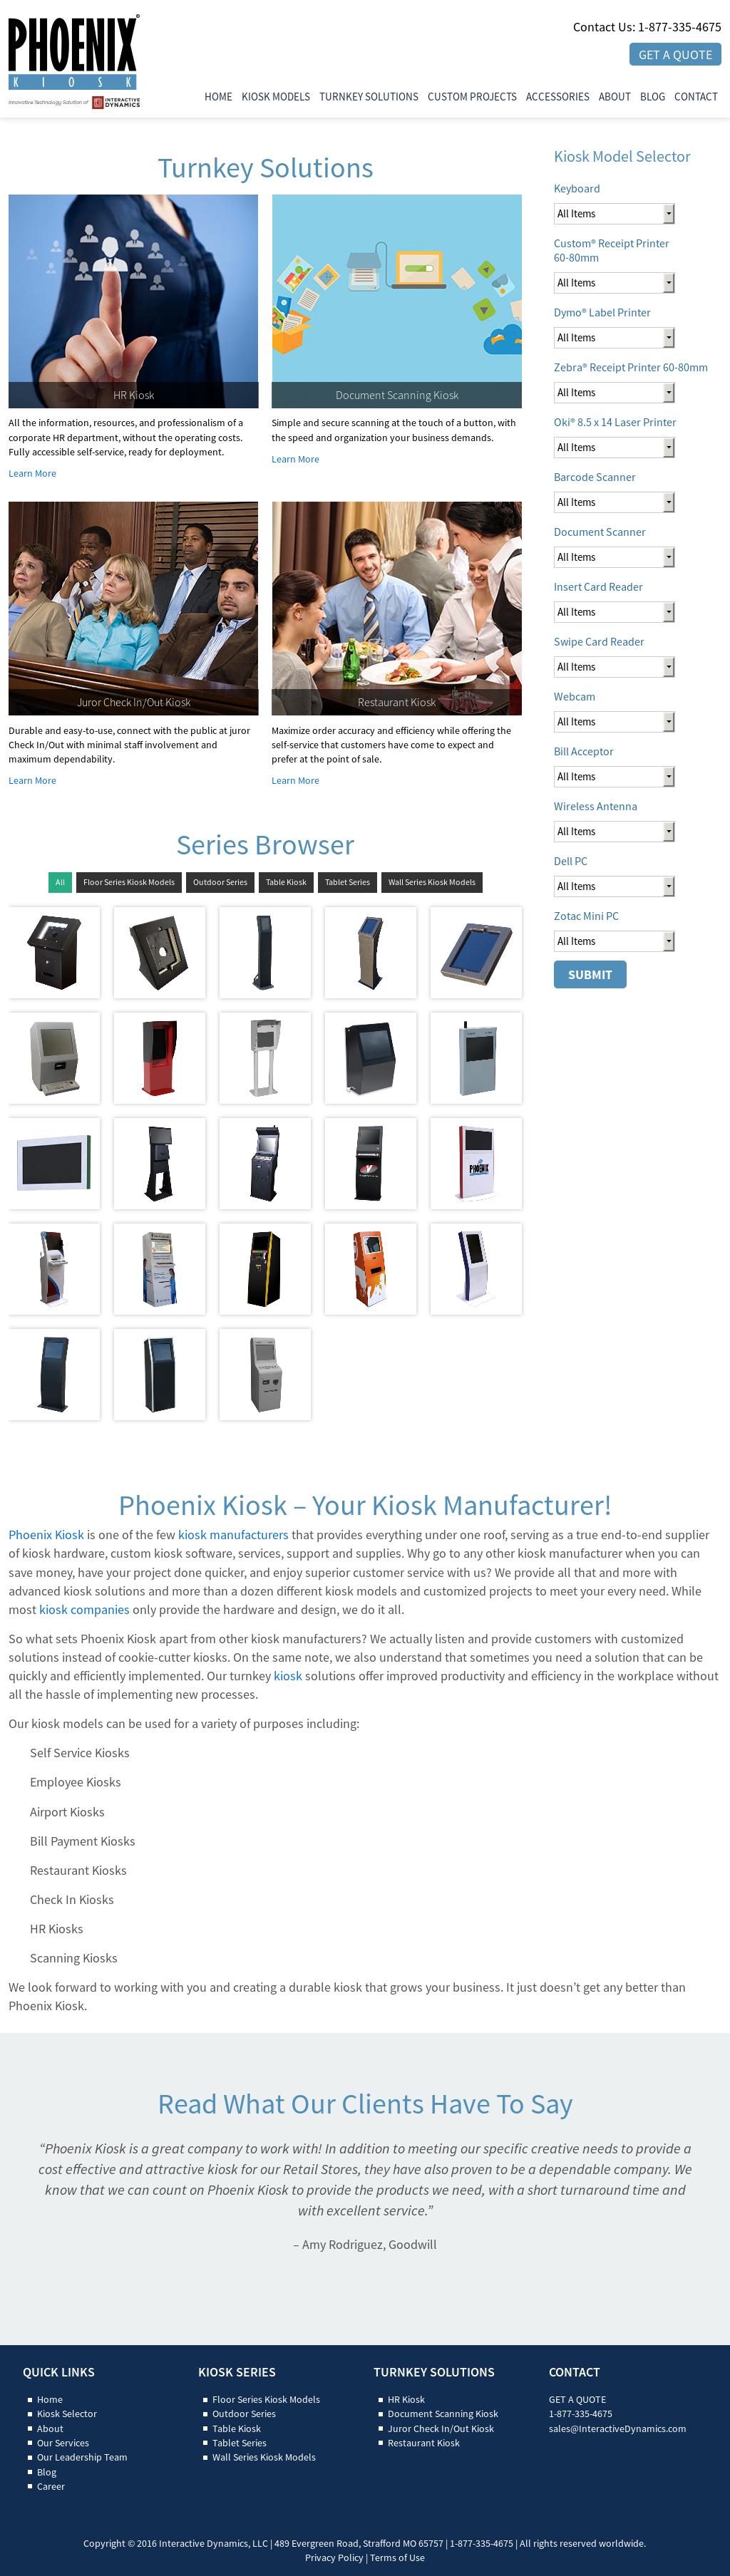 Phoenix Kiosk Competitors, Revenue and Employees - Owler Company Profile